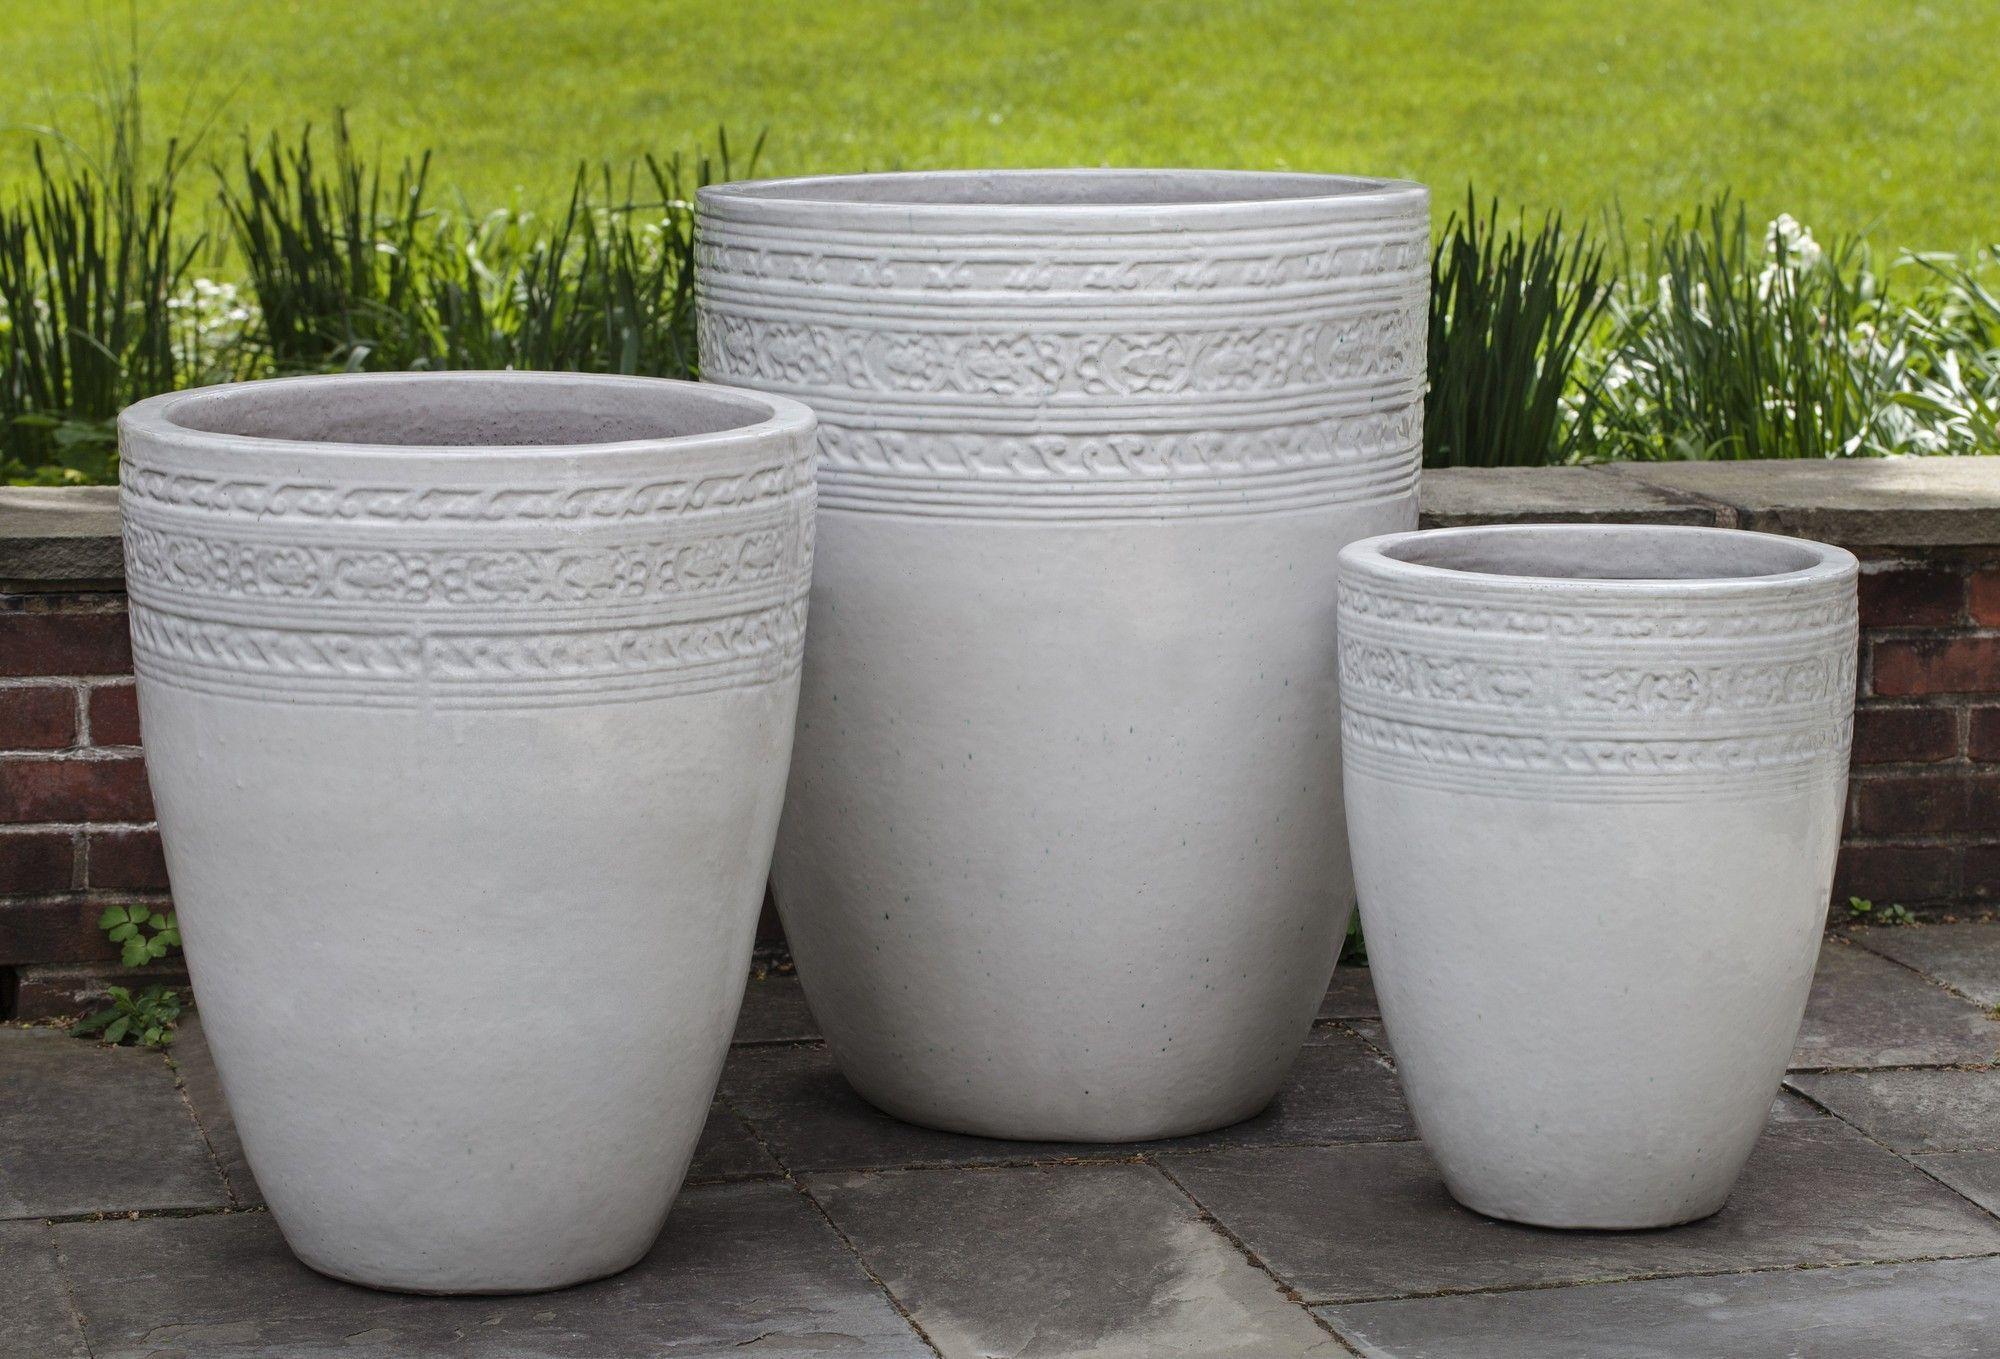 Sari 3 Piece Pot Planter Set Campania International Large Ceramic Planters Planters